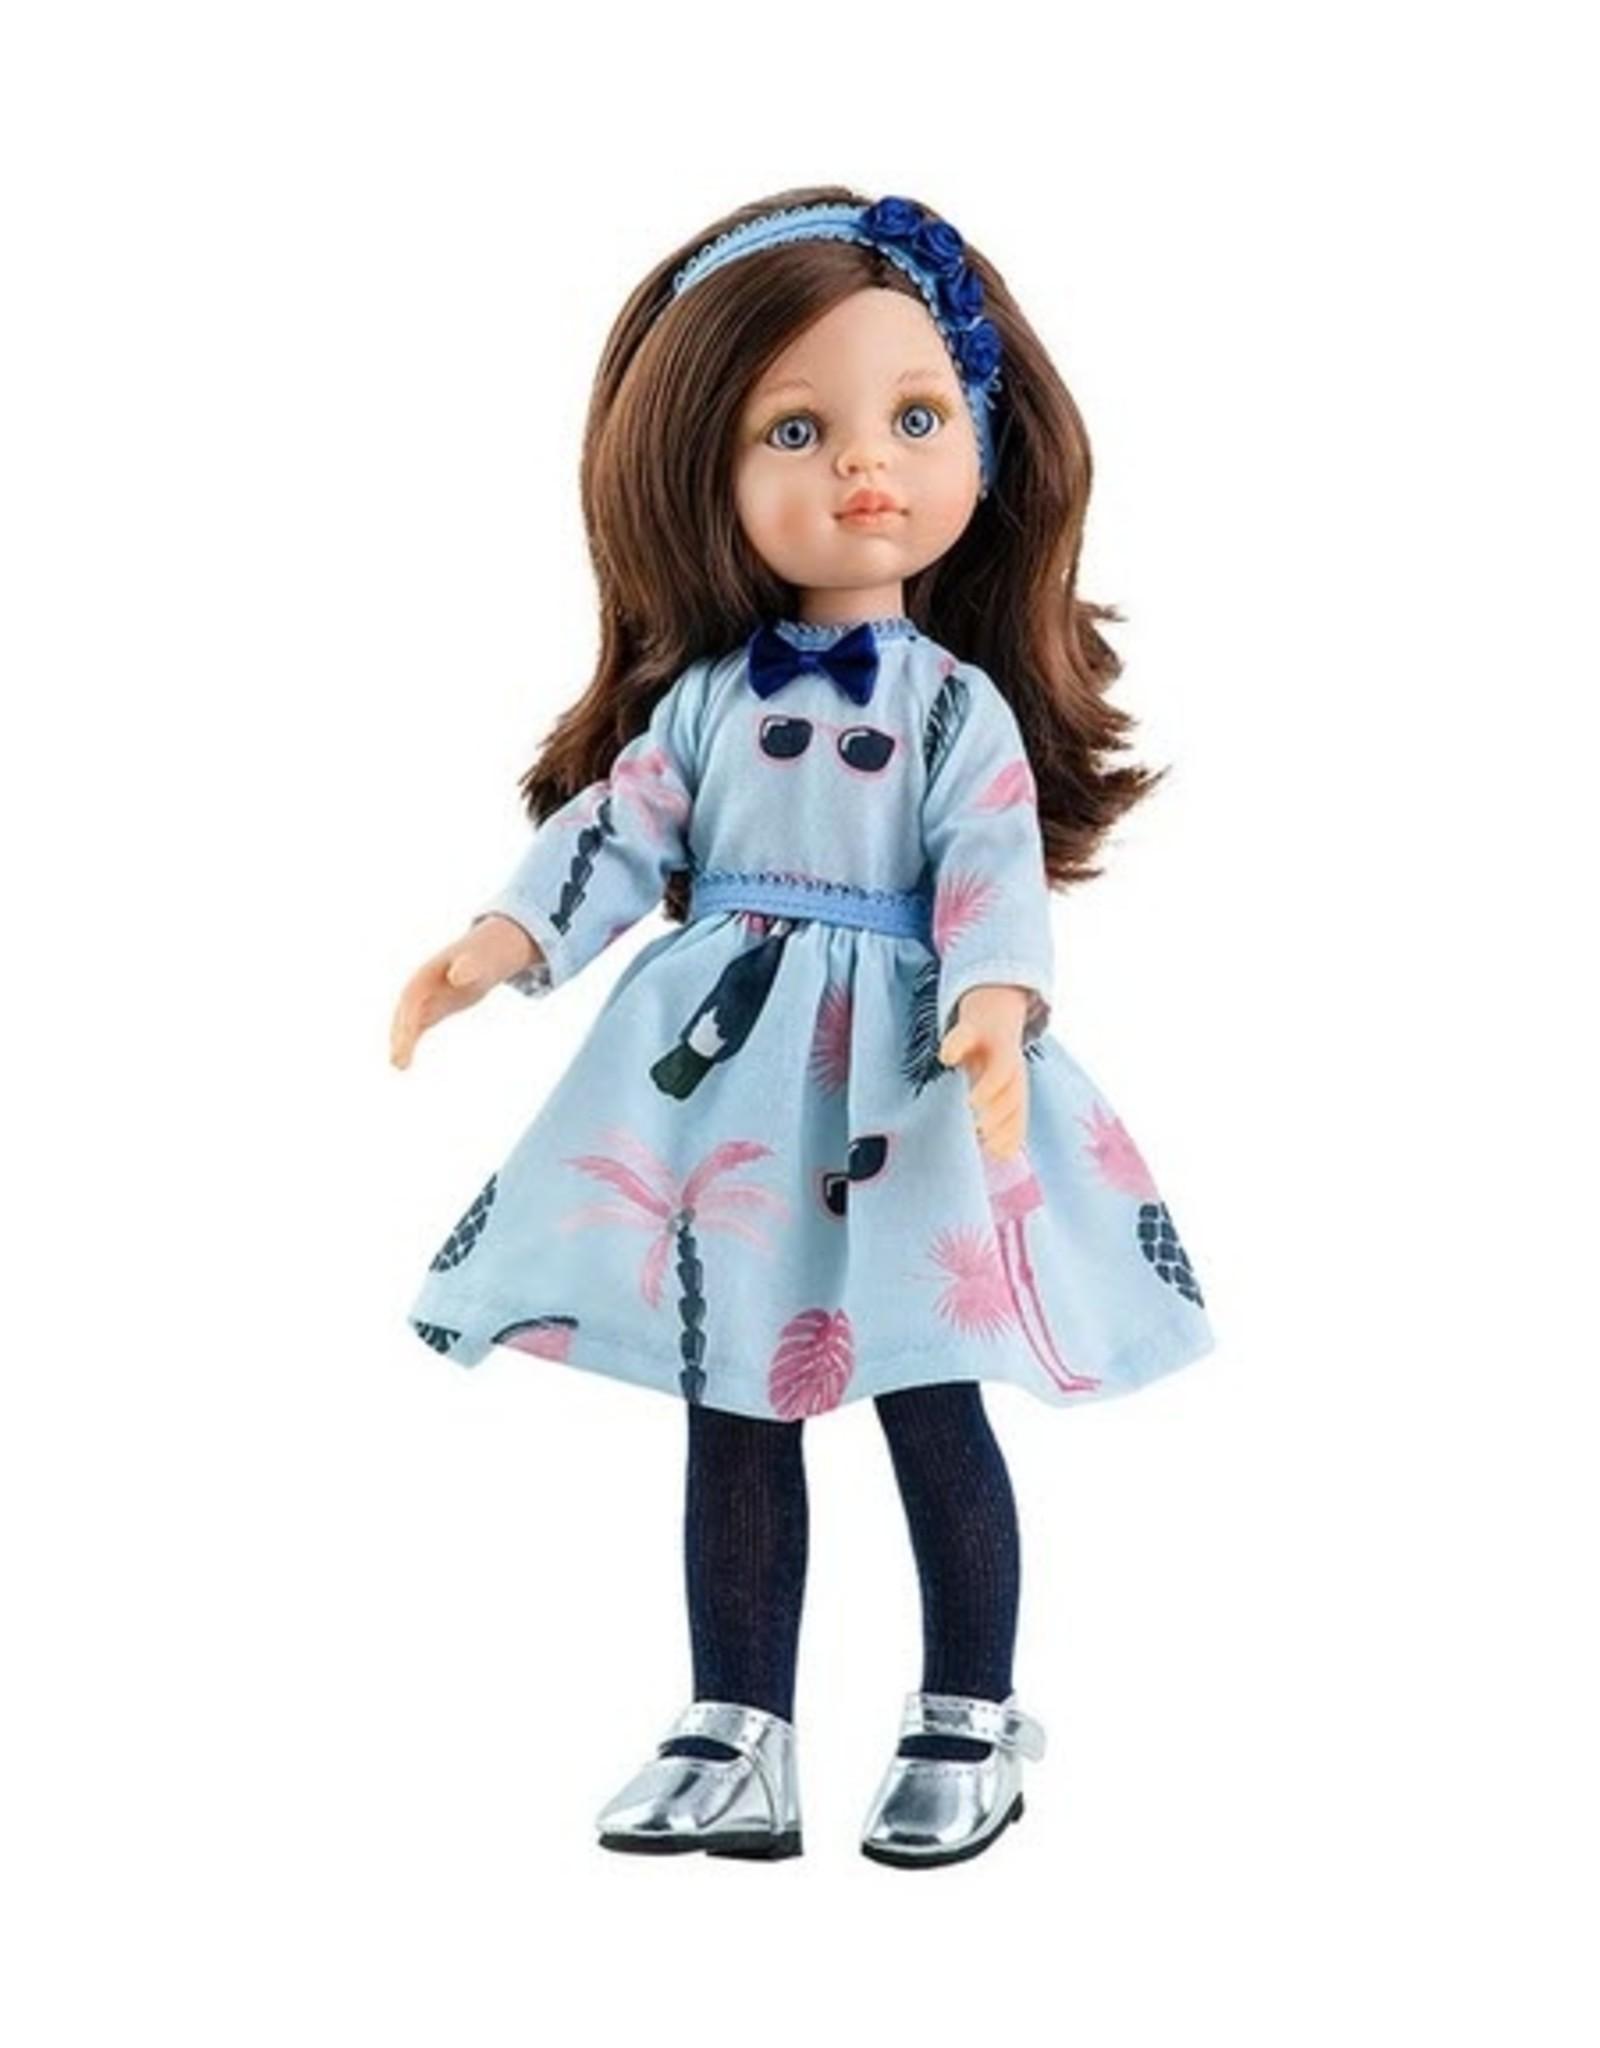 Paola Reina Paola Reina - Amiga Doll 32cm (4424)